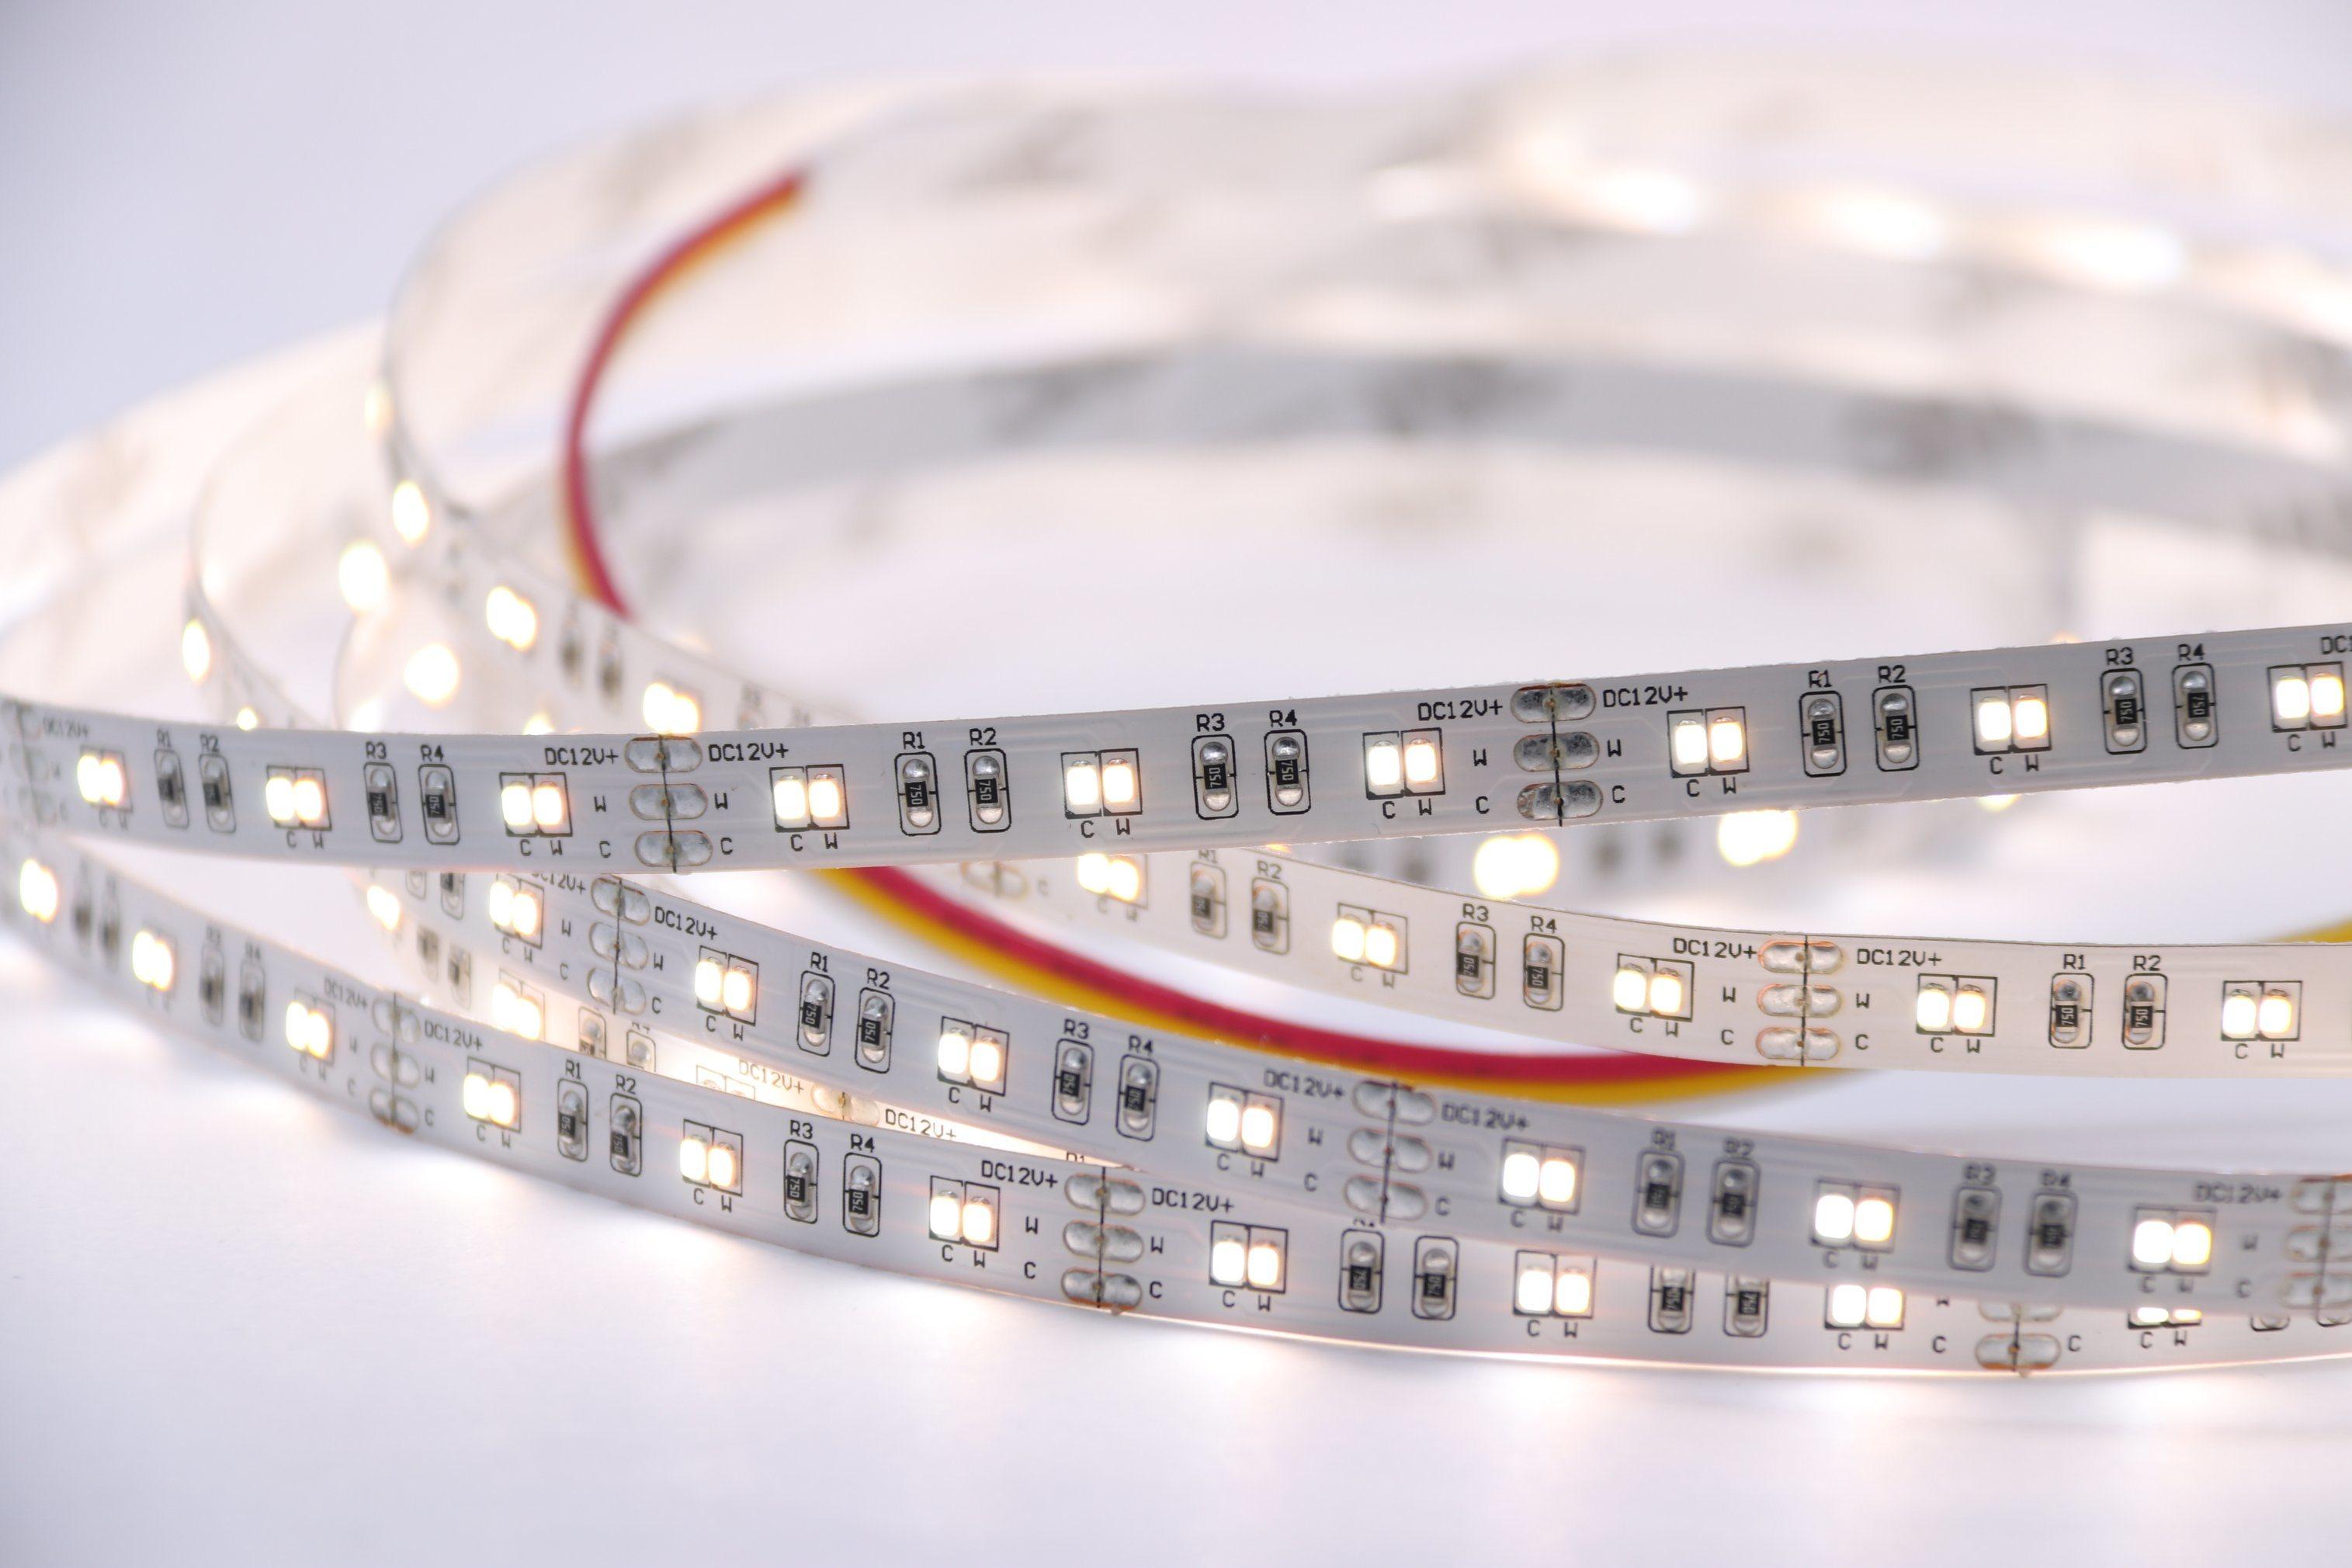 Outdoor Lighting 24V 240LEDs/M 5m/Roll LED Strip Light SMD 2216 Customized Single Color Flexible LED Strip Eco-Friendly Flexible LED Light Bar for ...